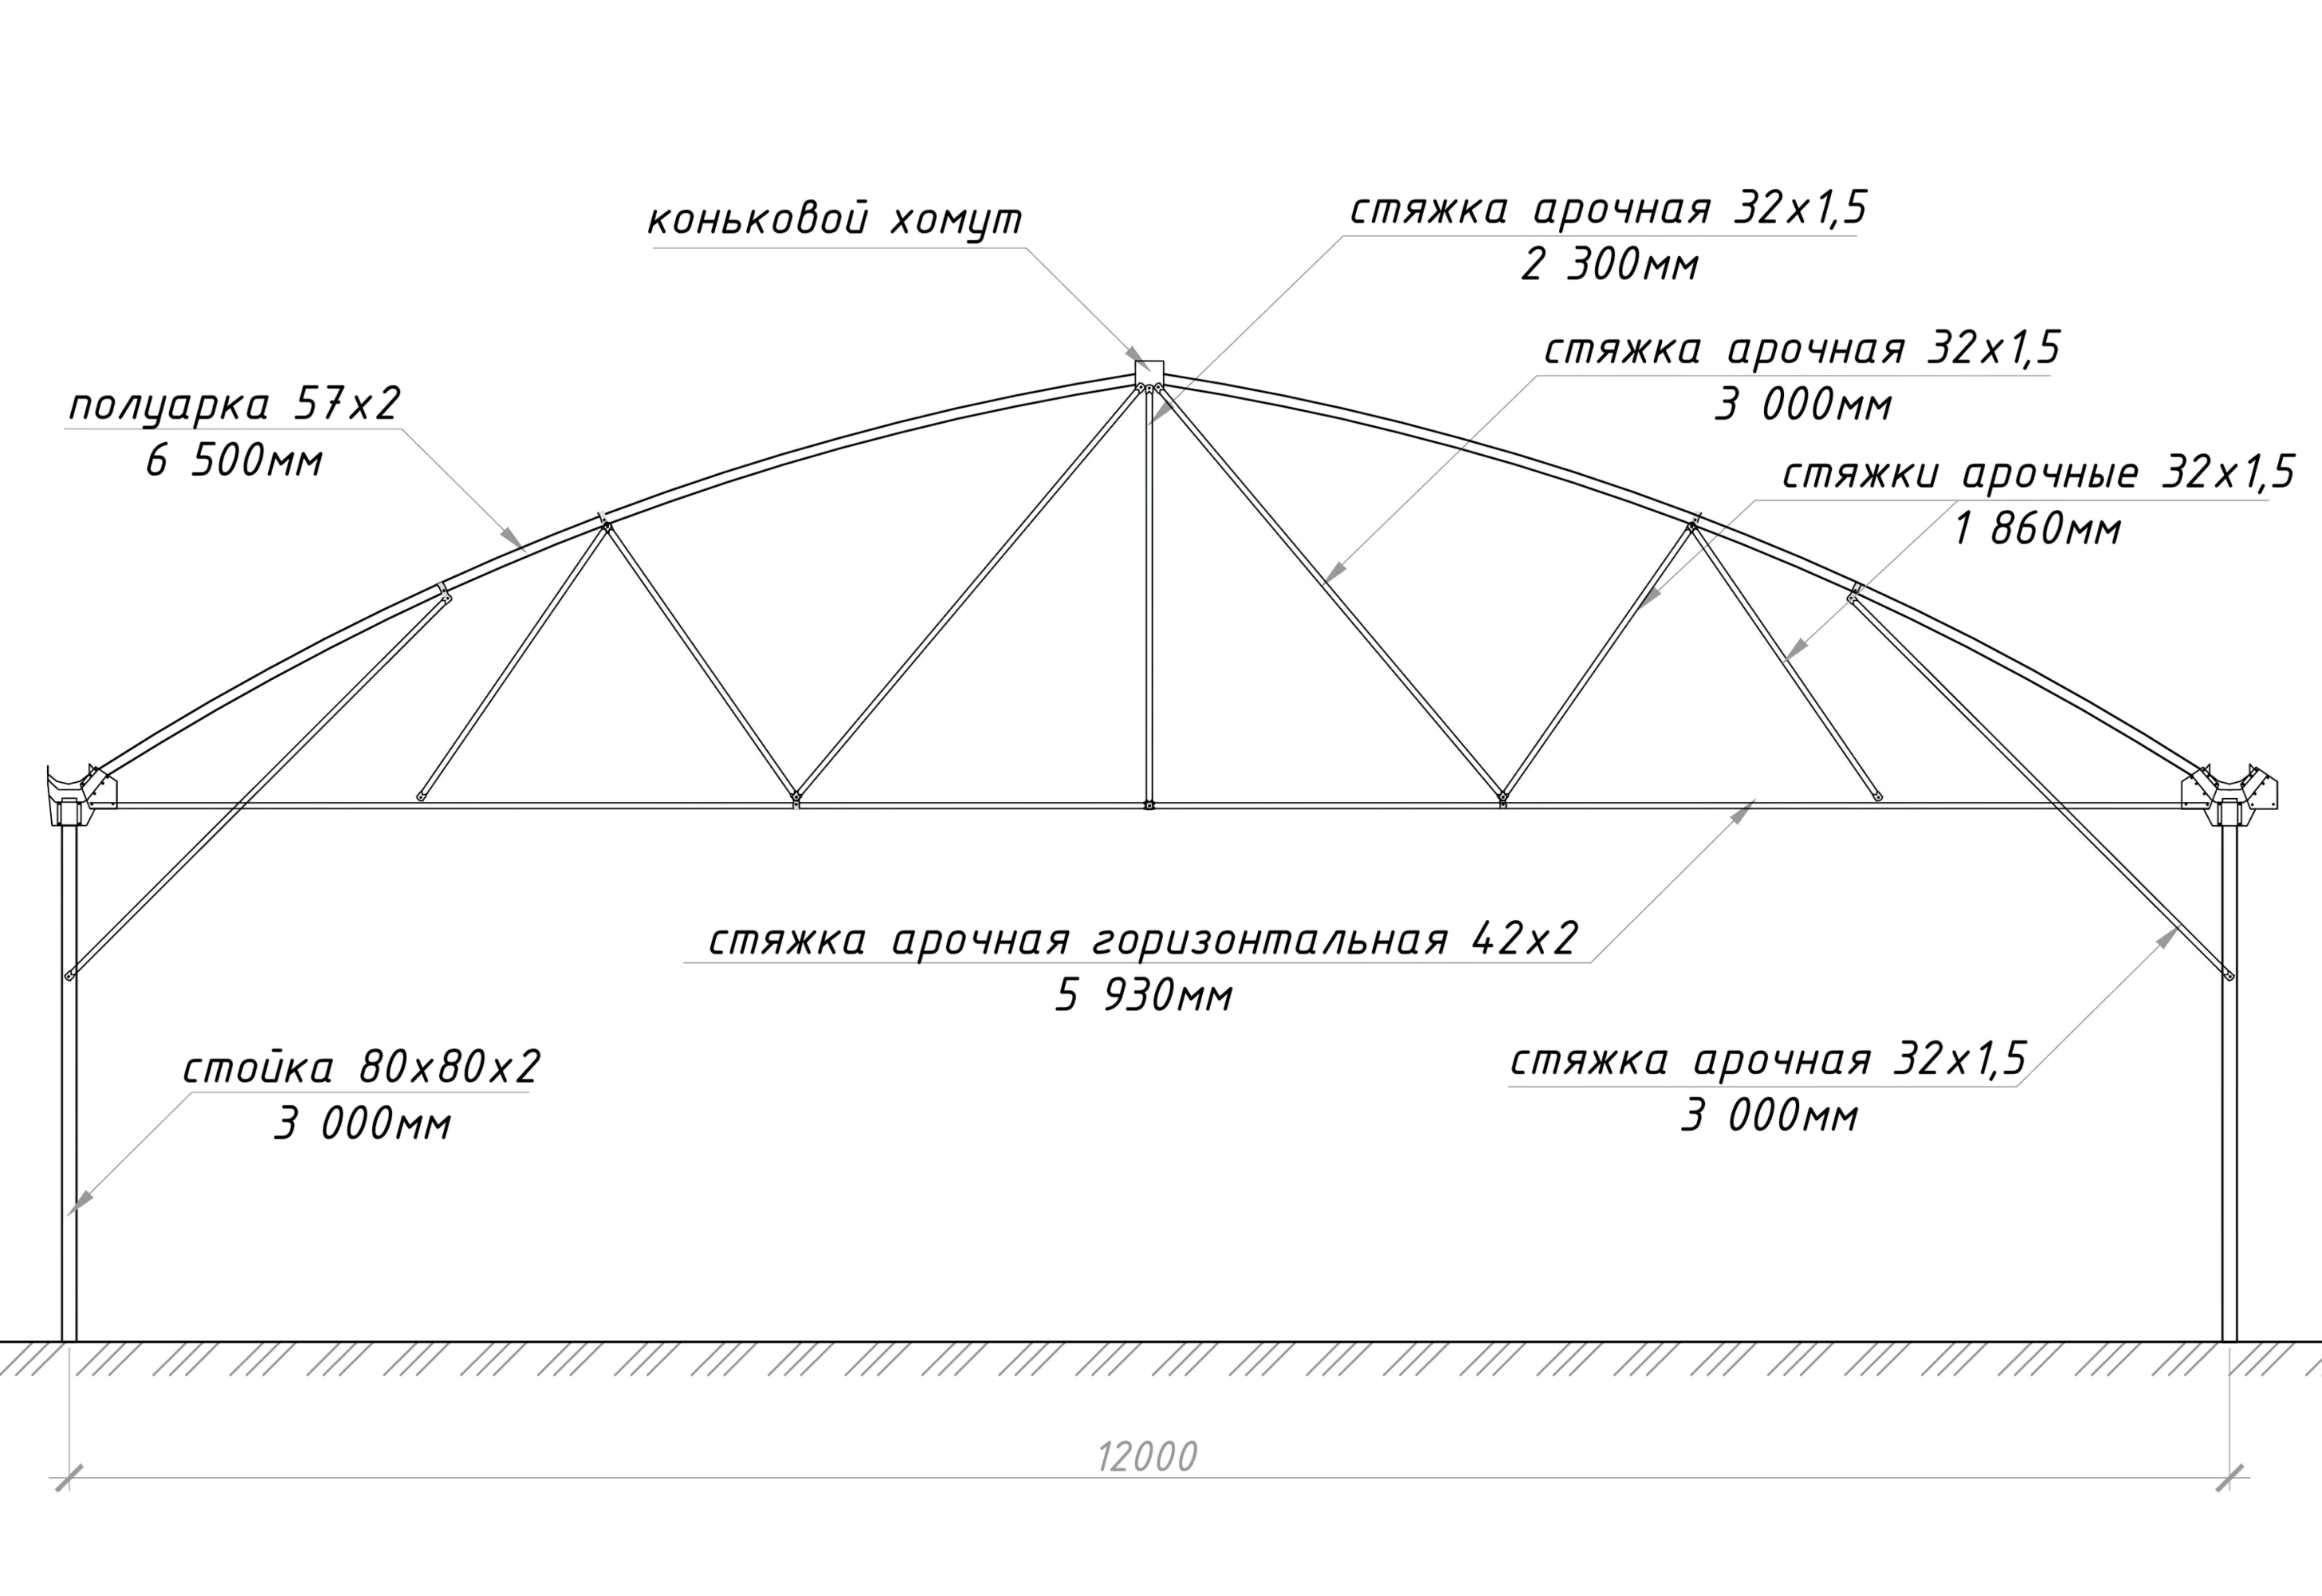 Многорядная (блочная) теплица 12м